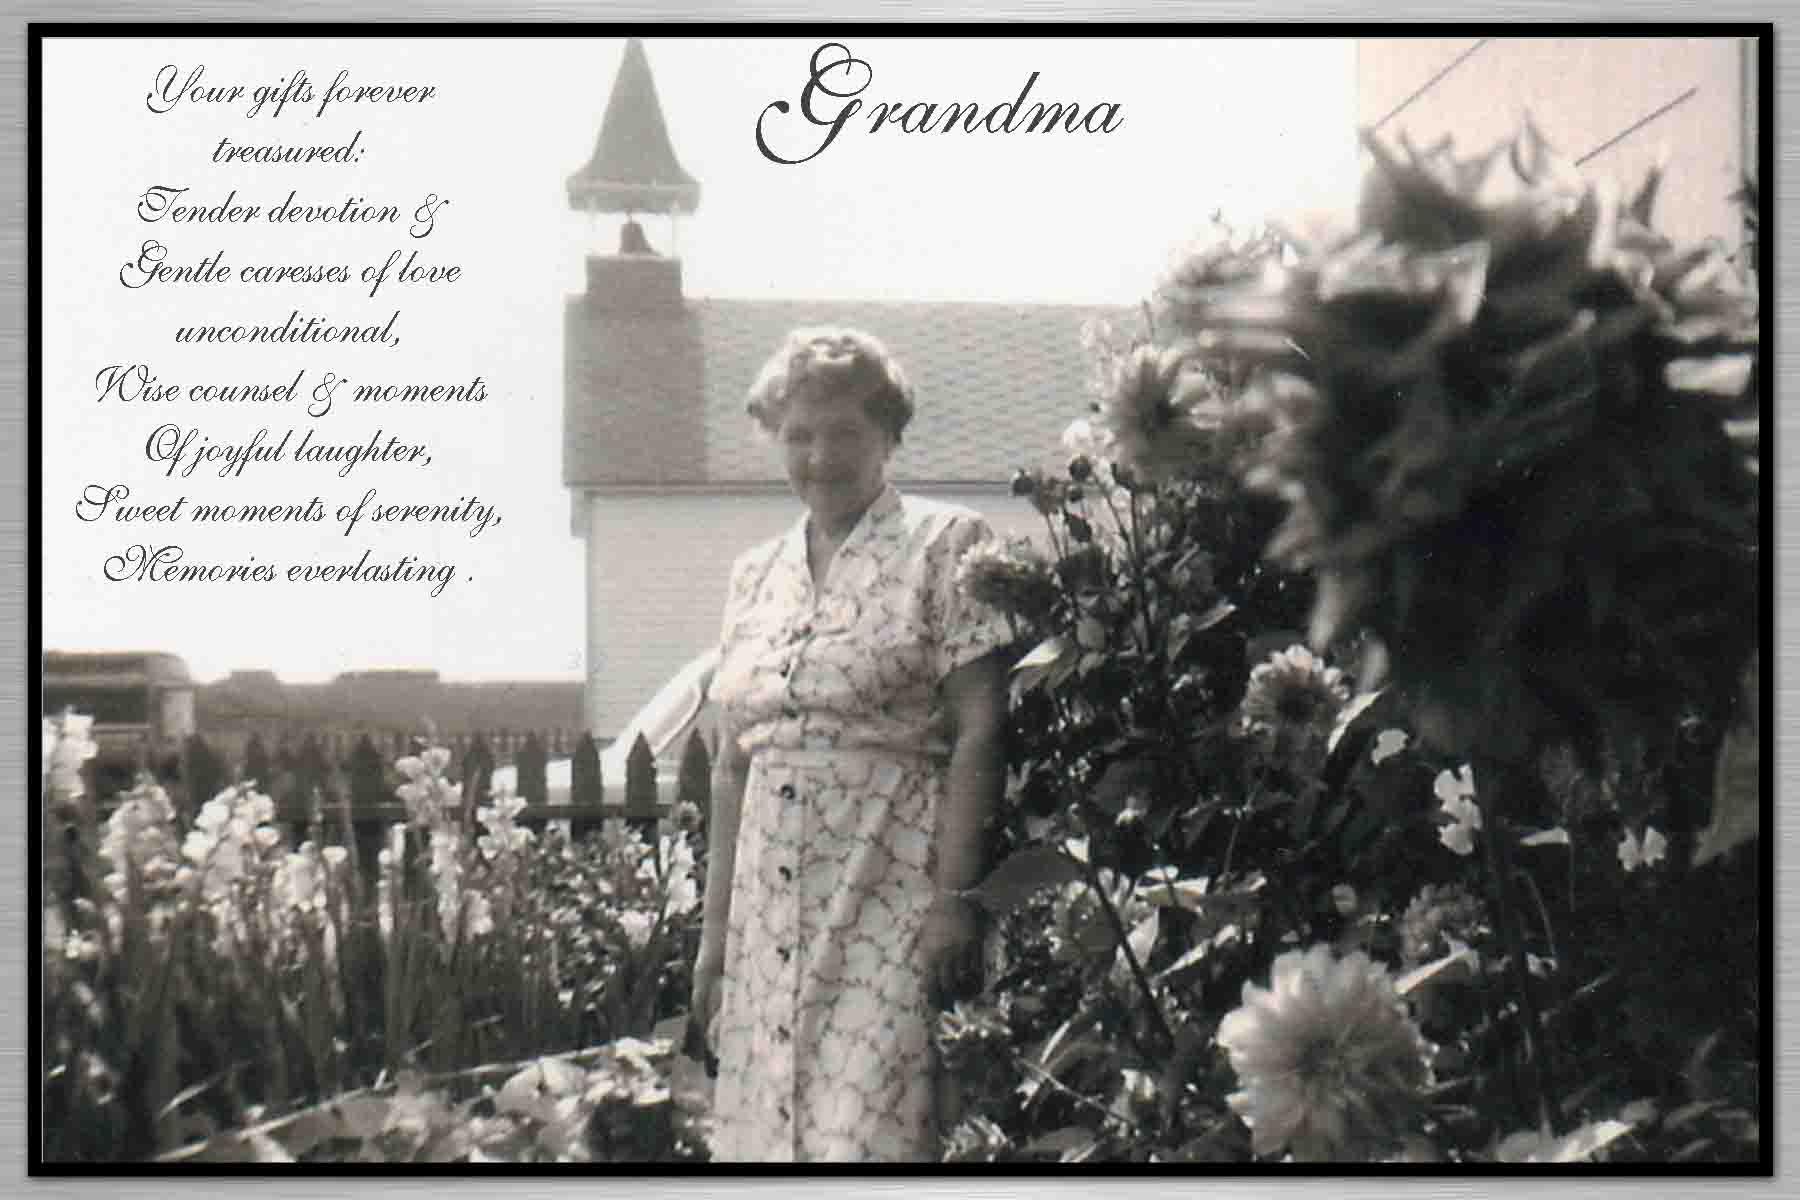 Grandma tribute-1 copy